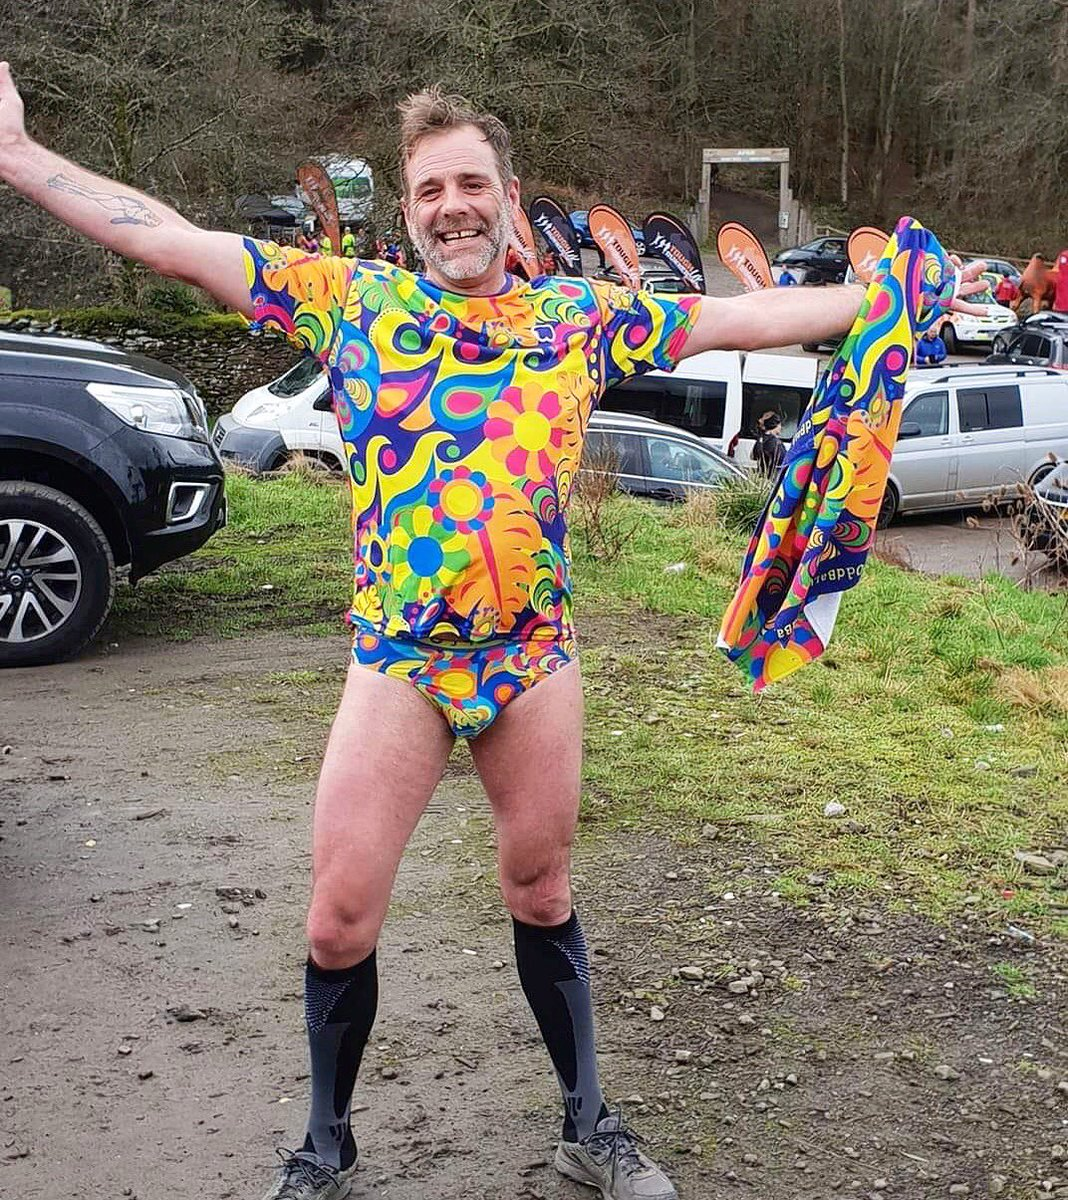 217227d3da #hippyjungle #towel #rugbytop #underwear #myoddballs #oddballs #briefs  #mensunderwearpic.twitter.com/TlVnt2RnkT